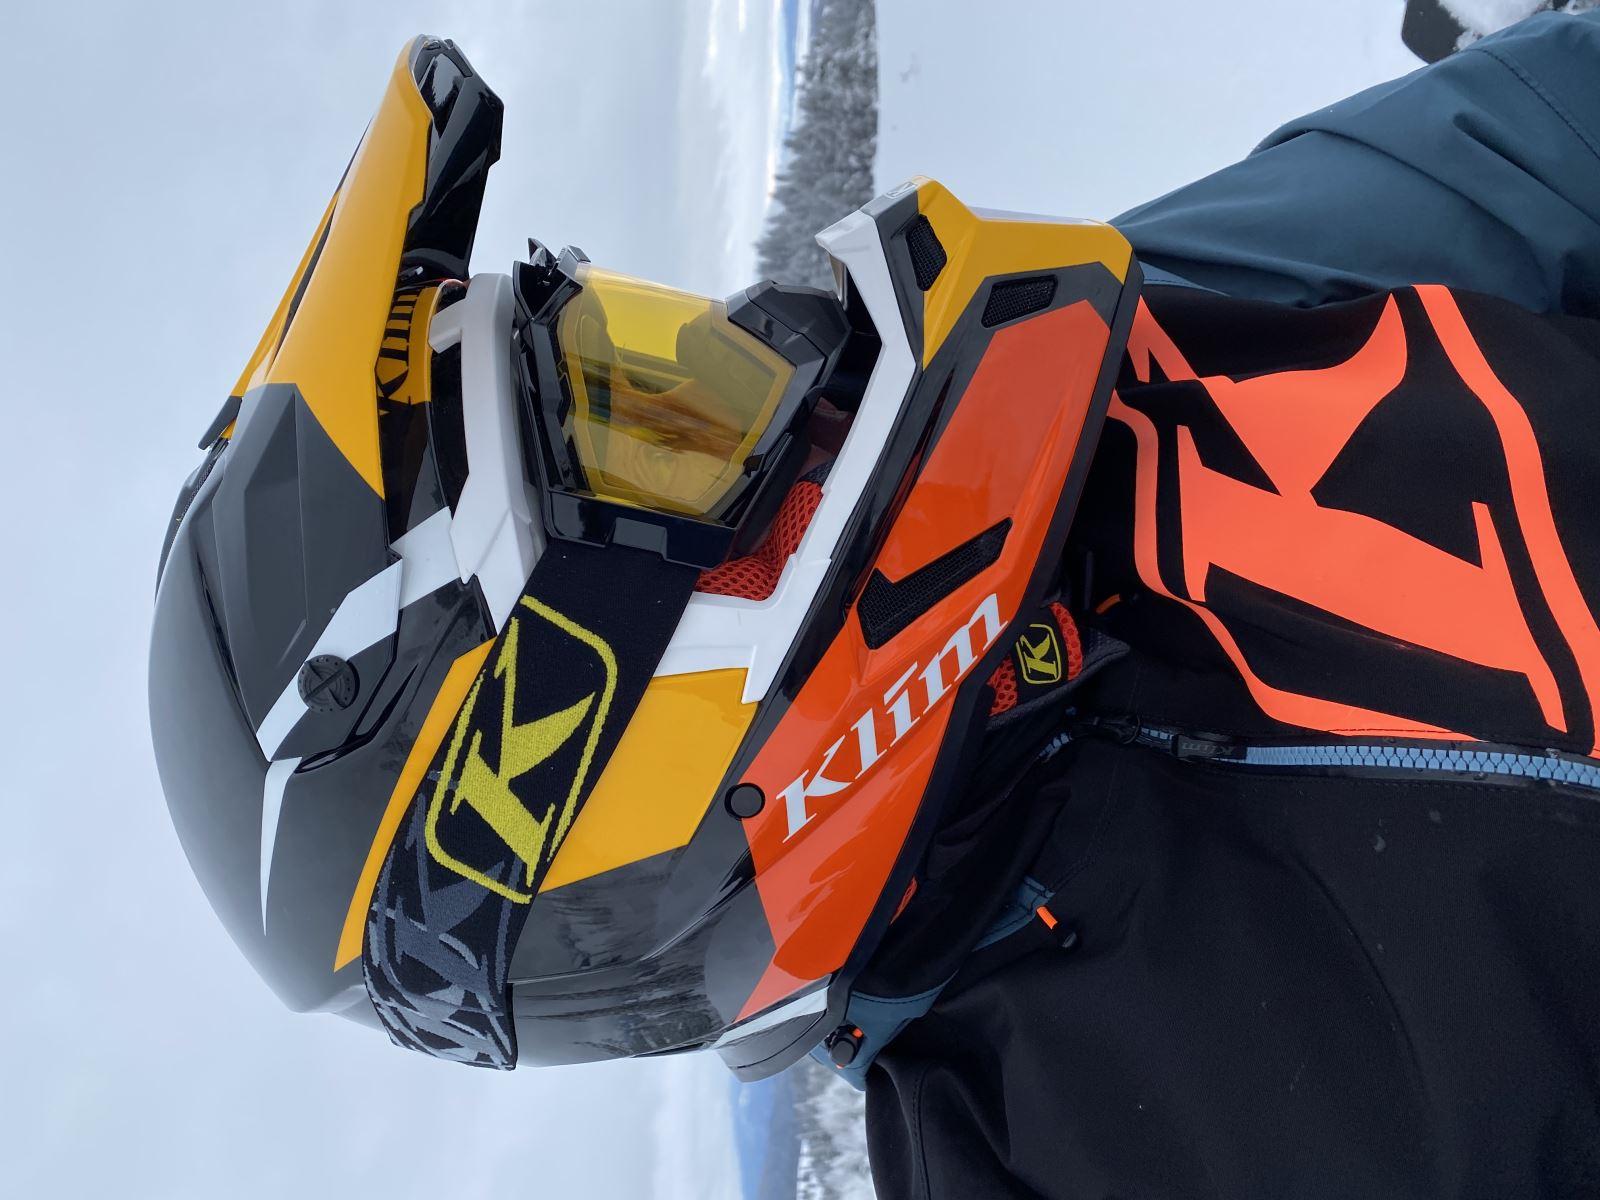 klim snowmobile gear the best keeps